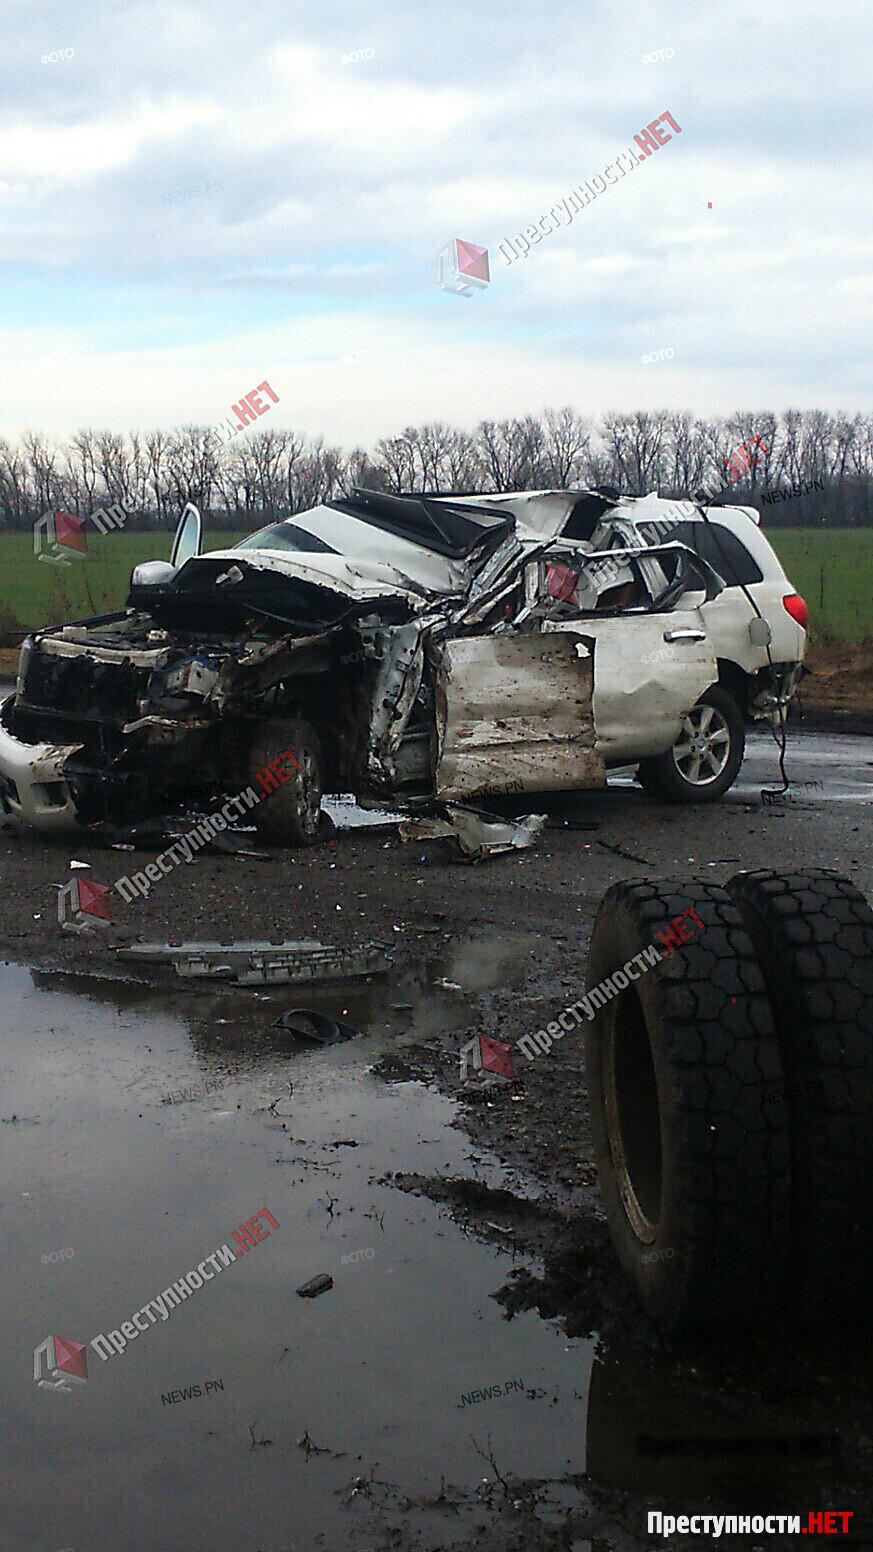 фото возле автомобиля